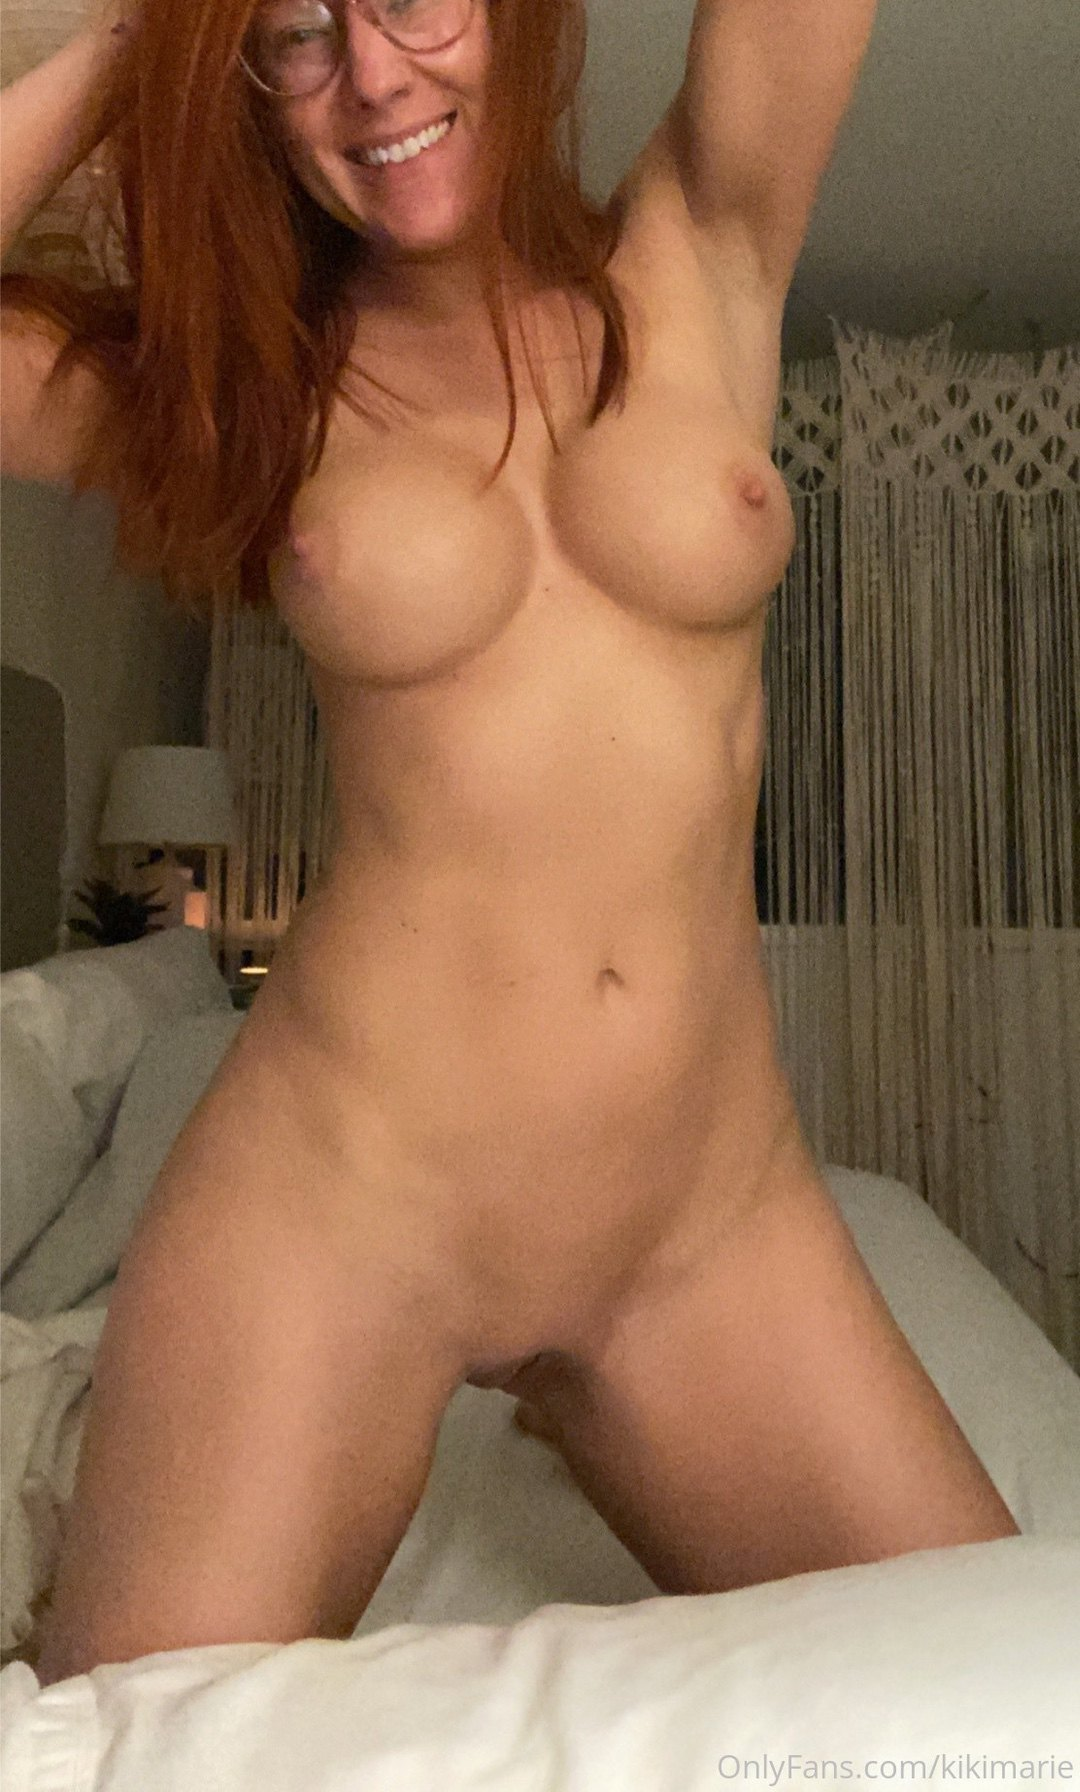 Kiki Marie Kikimarie Onlyfans Nudes Leaks 0009